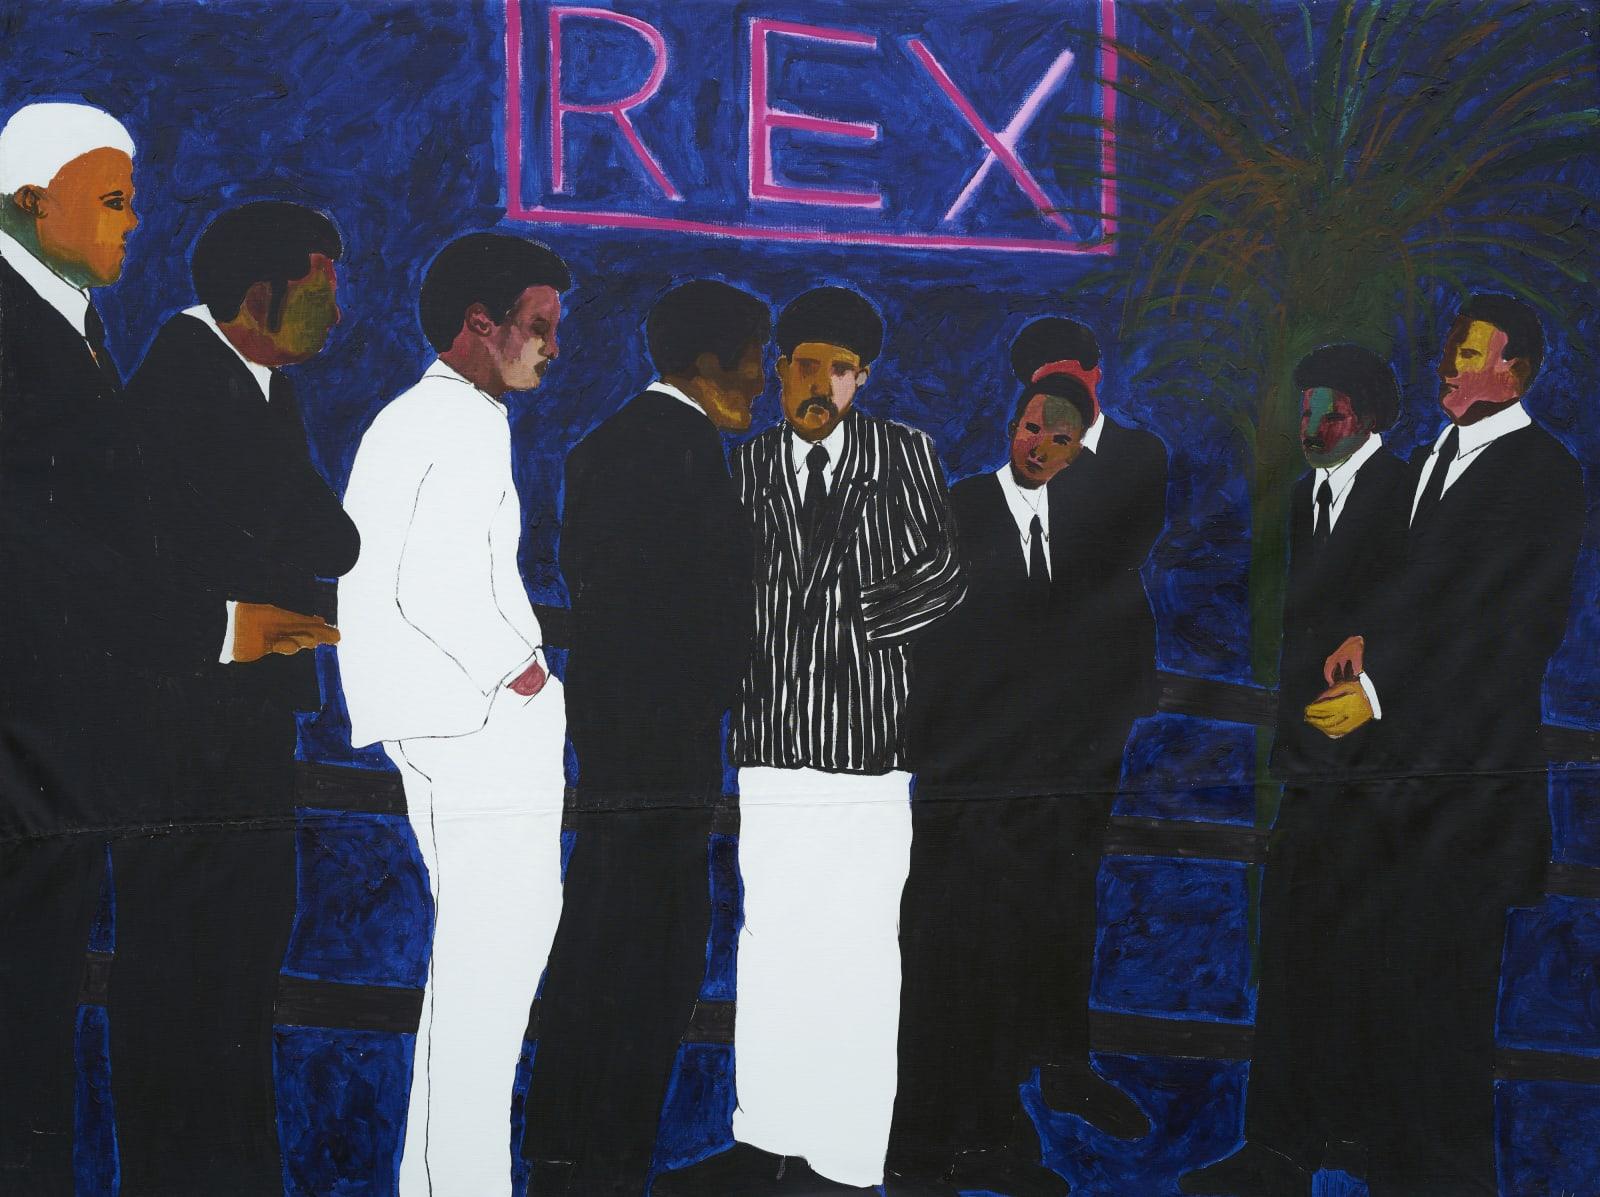 Gideon Appah, Rex 2, 2020